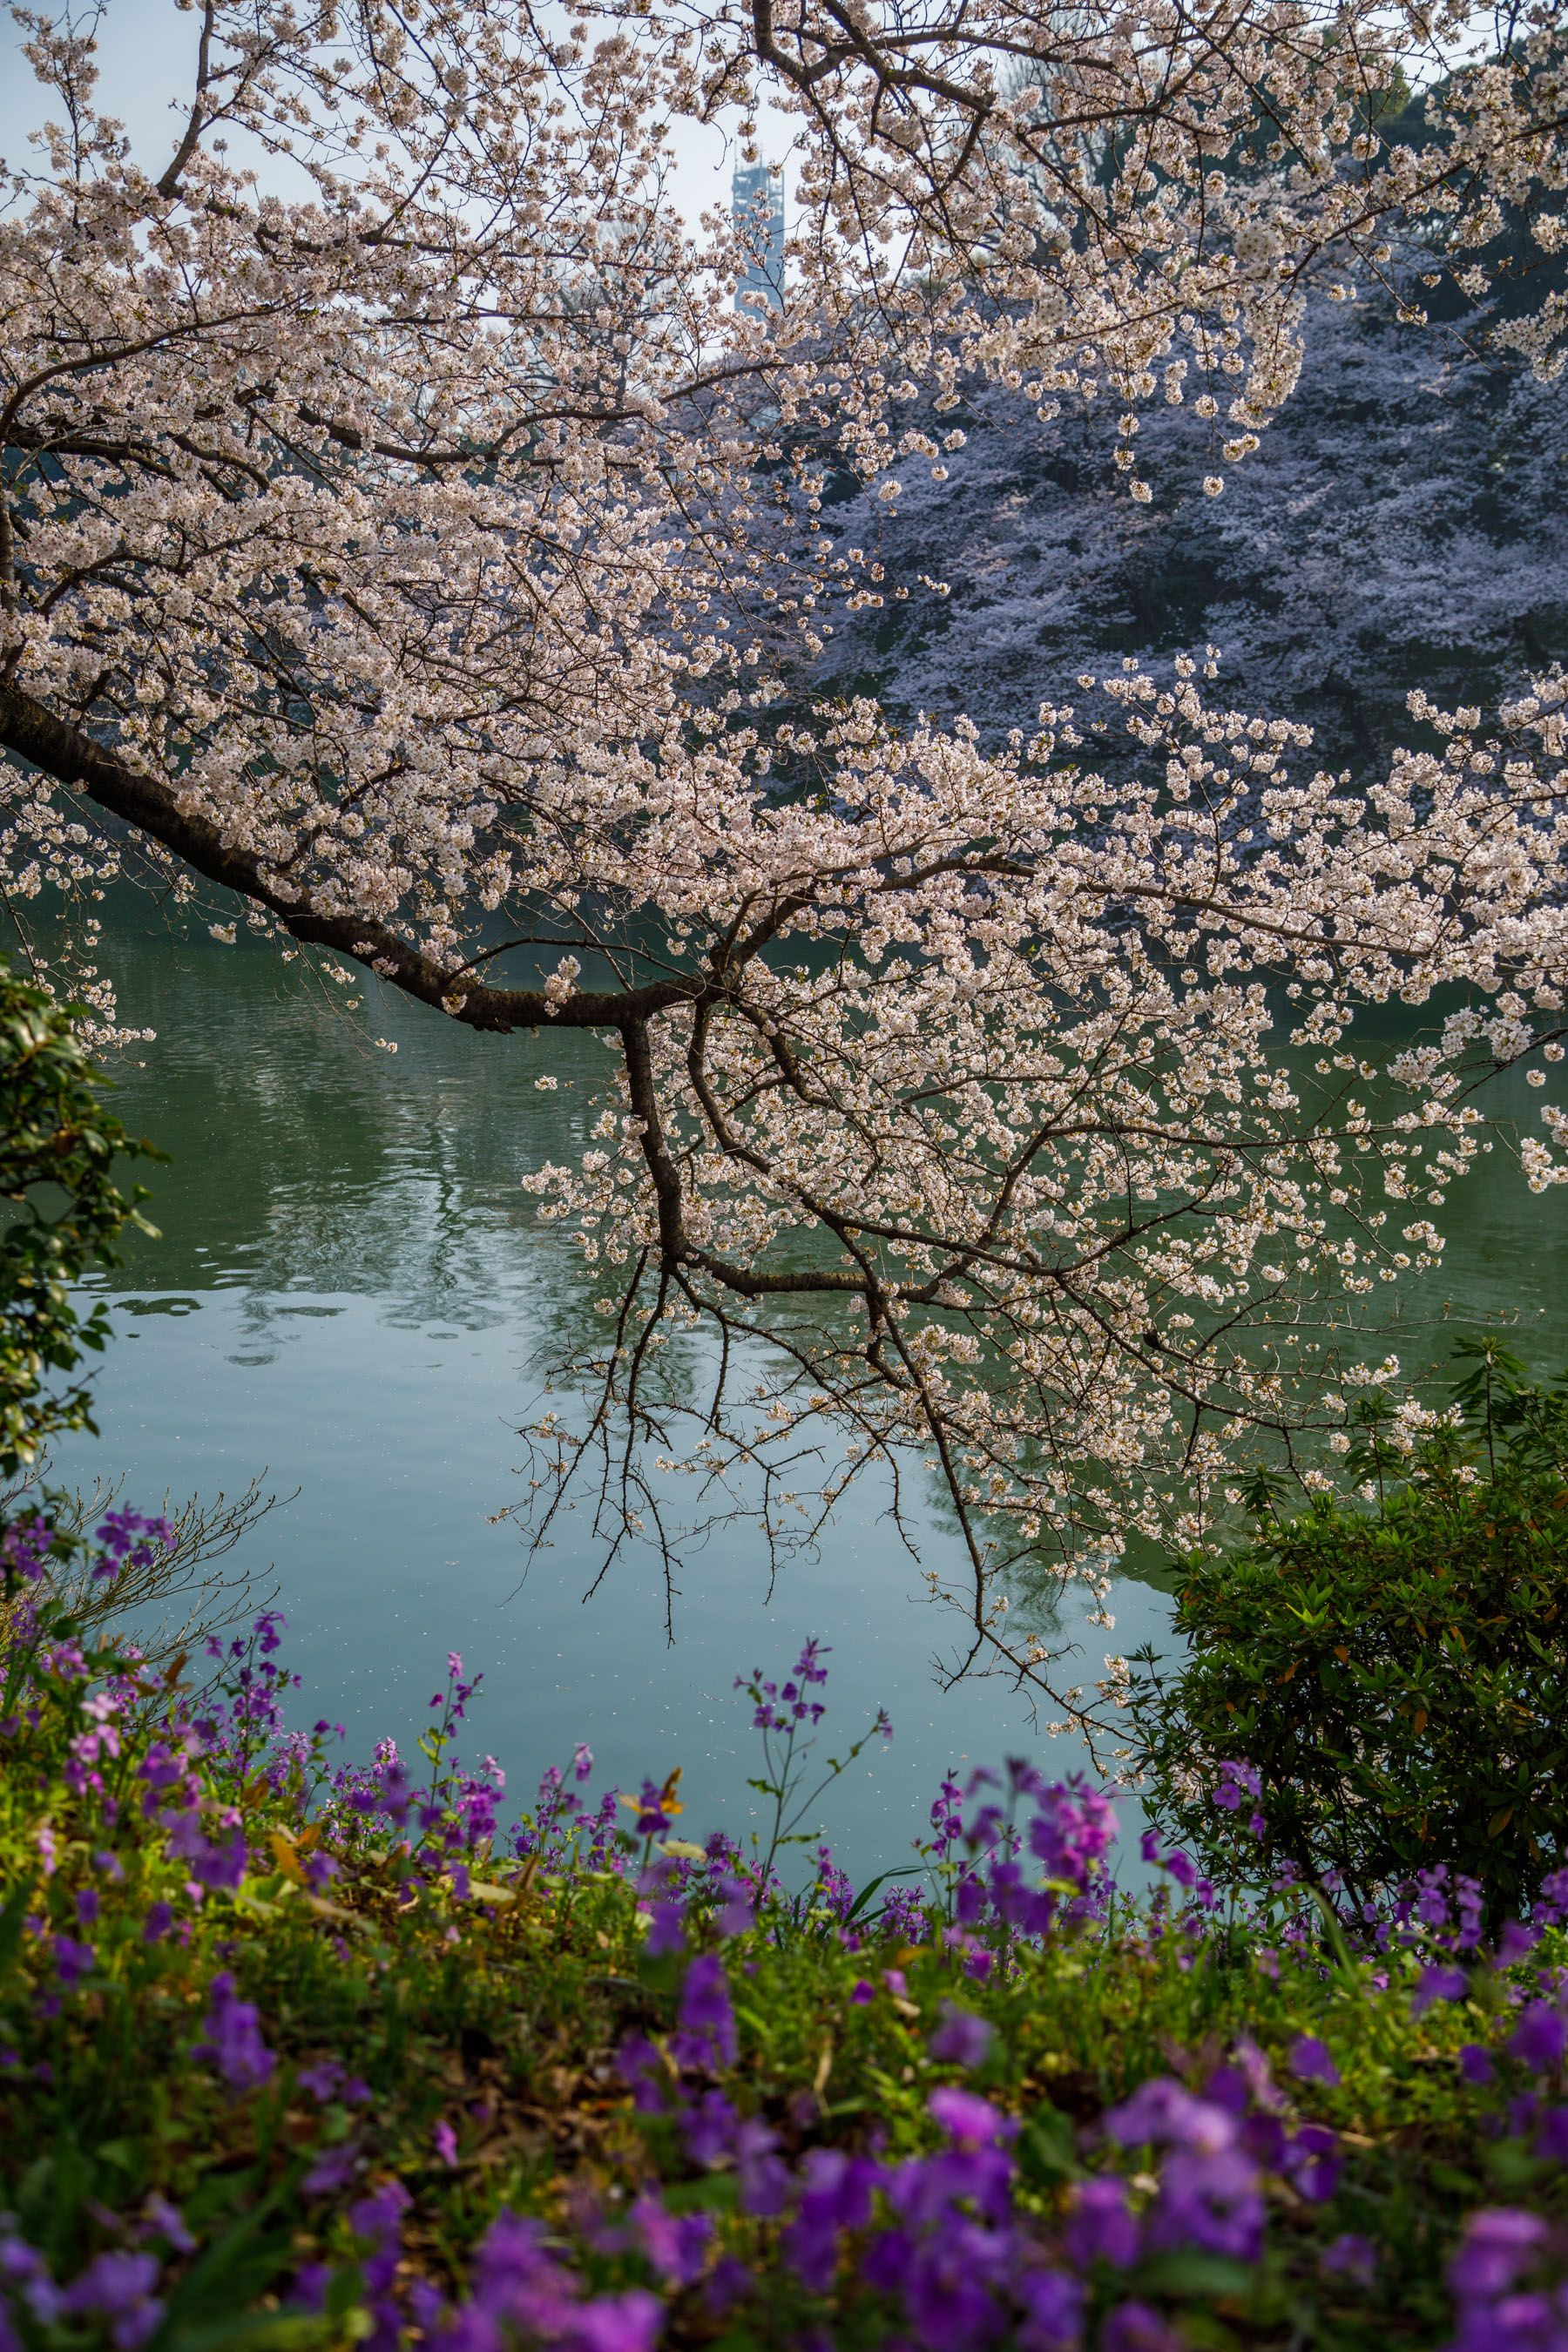 Instagrammable Spots In Japan 7 Gorgeous Spots For Cherry Blossoms In Japan Cherry Blossom Japan Spring Vacation Spots Travel Destinations Australia